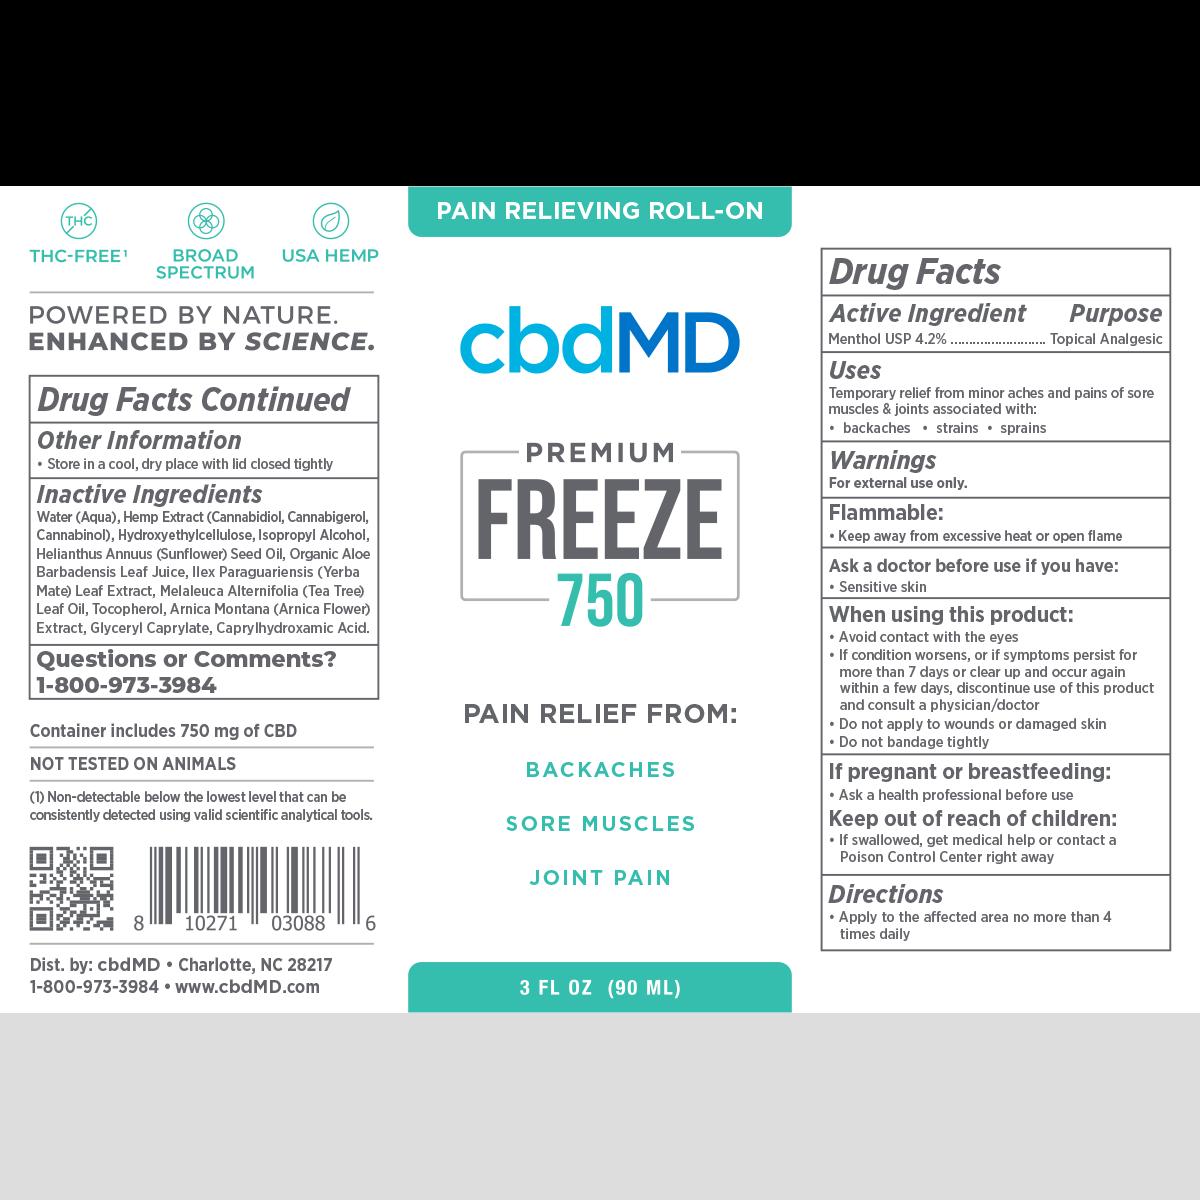 cbdmd_roll-on_freeze_750_label_Herbane_Health